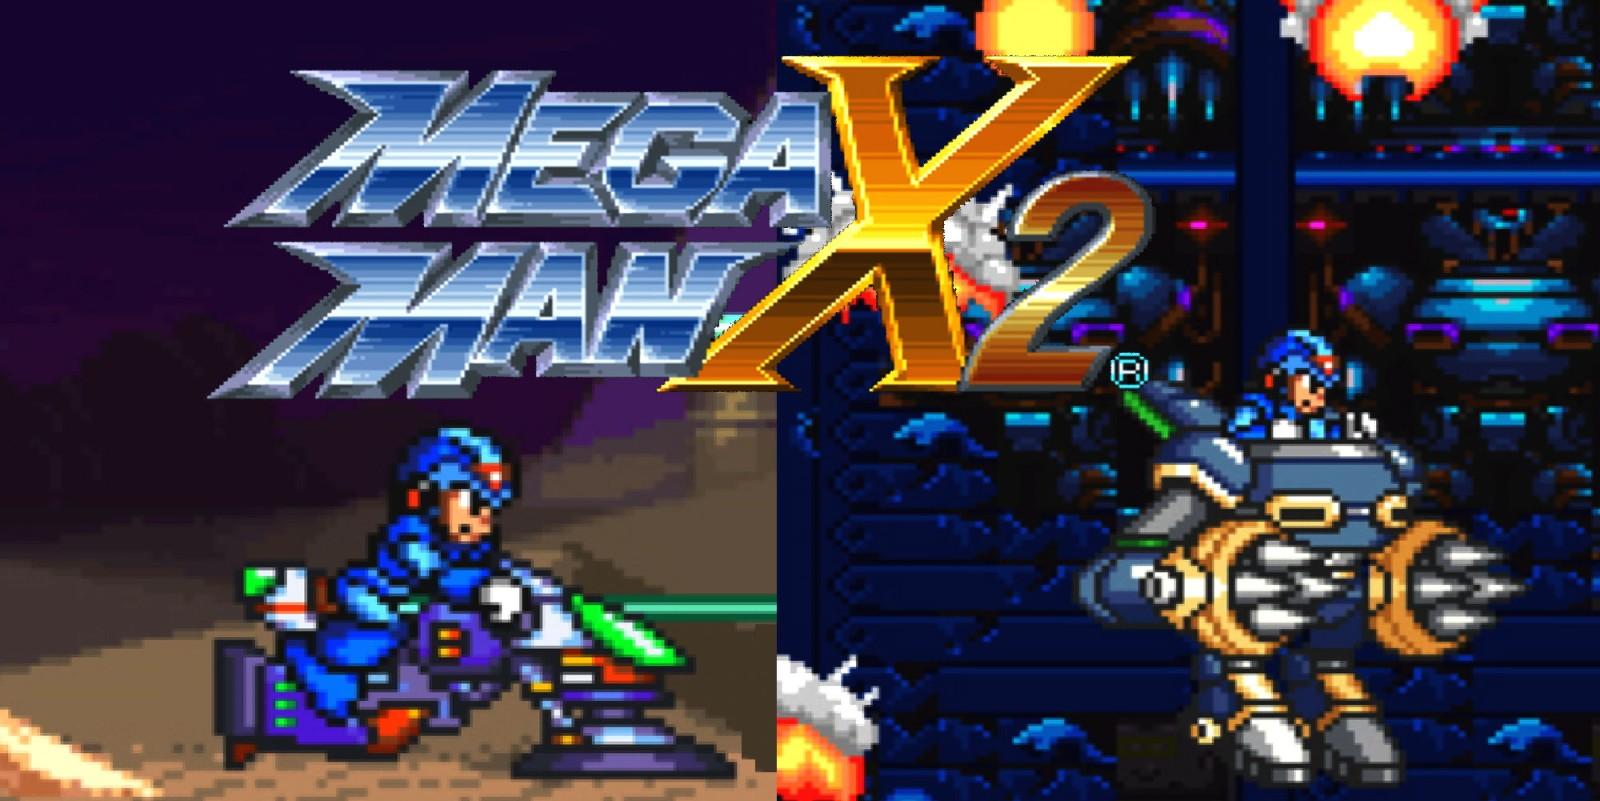 Mega man x2 super nintendo games nintendo - Megaman x virtual console ...